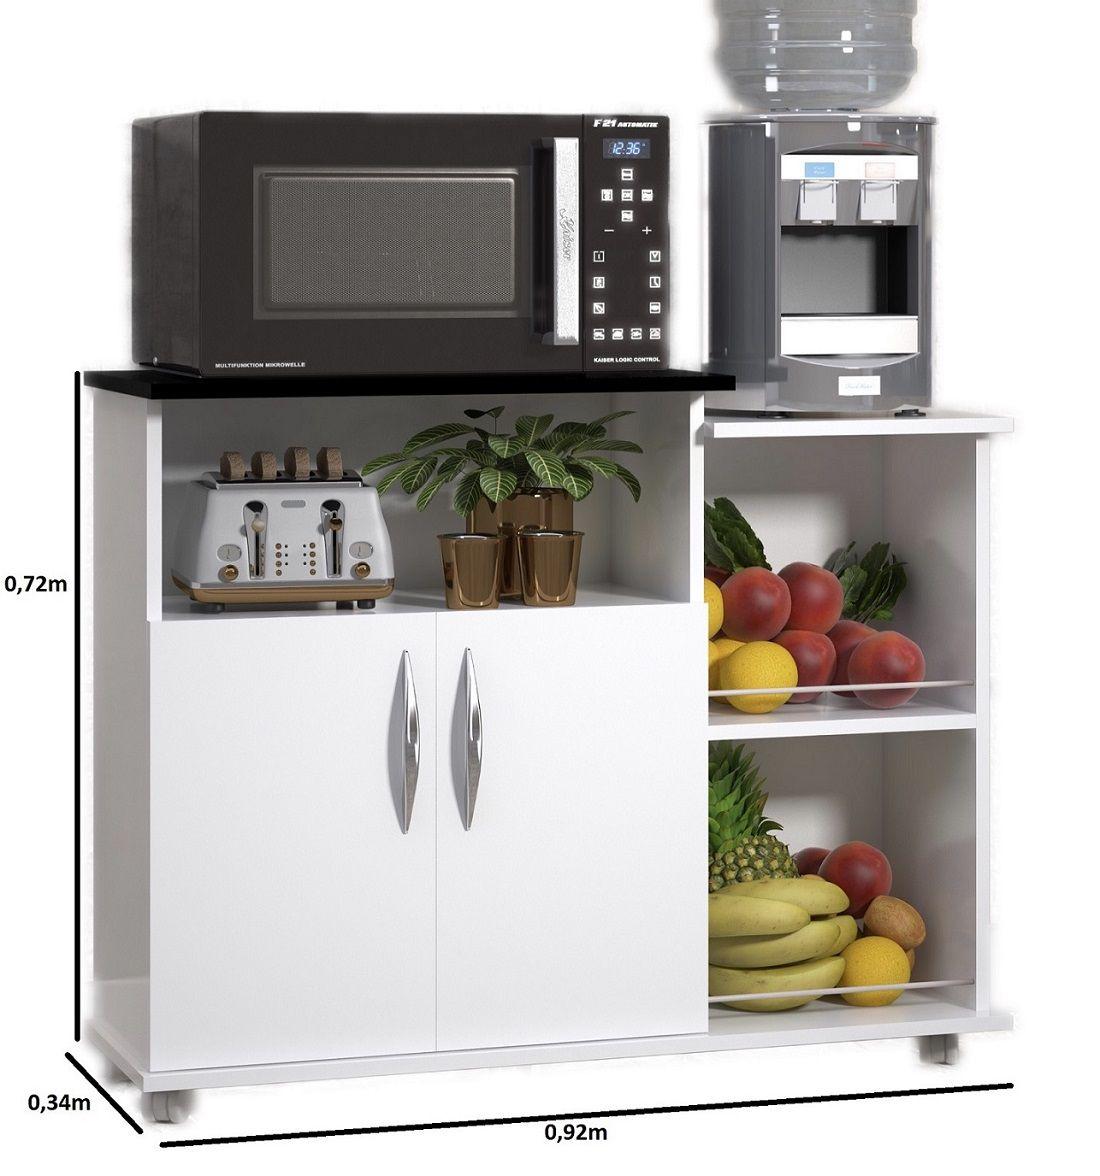 Fruteira Cozinha 2 Portas Base Microondas Utensílios Branco C/ Preto